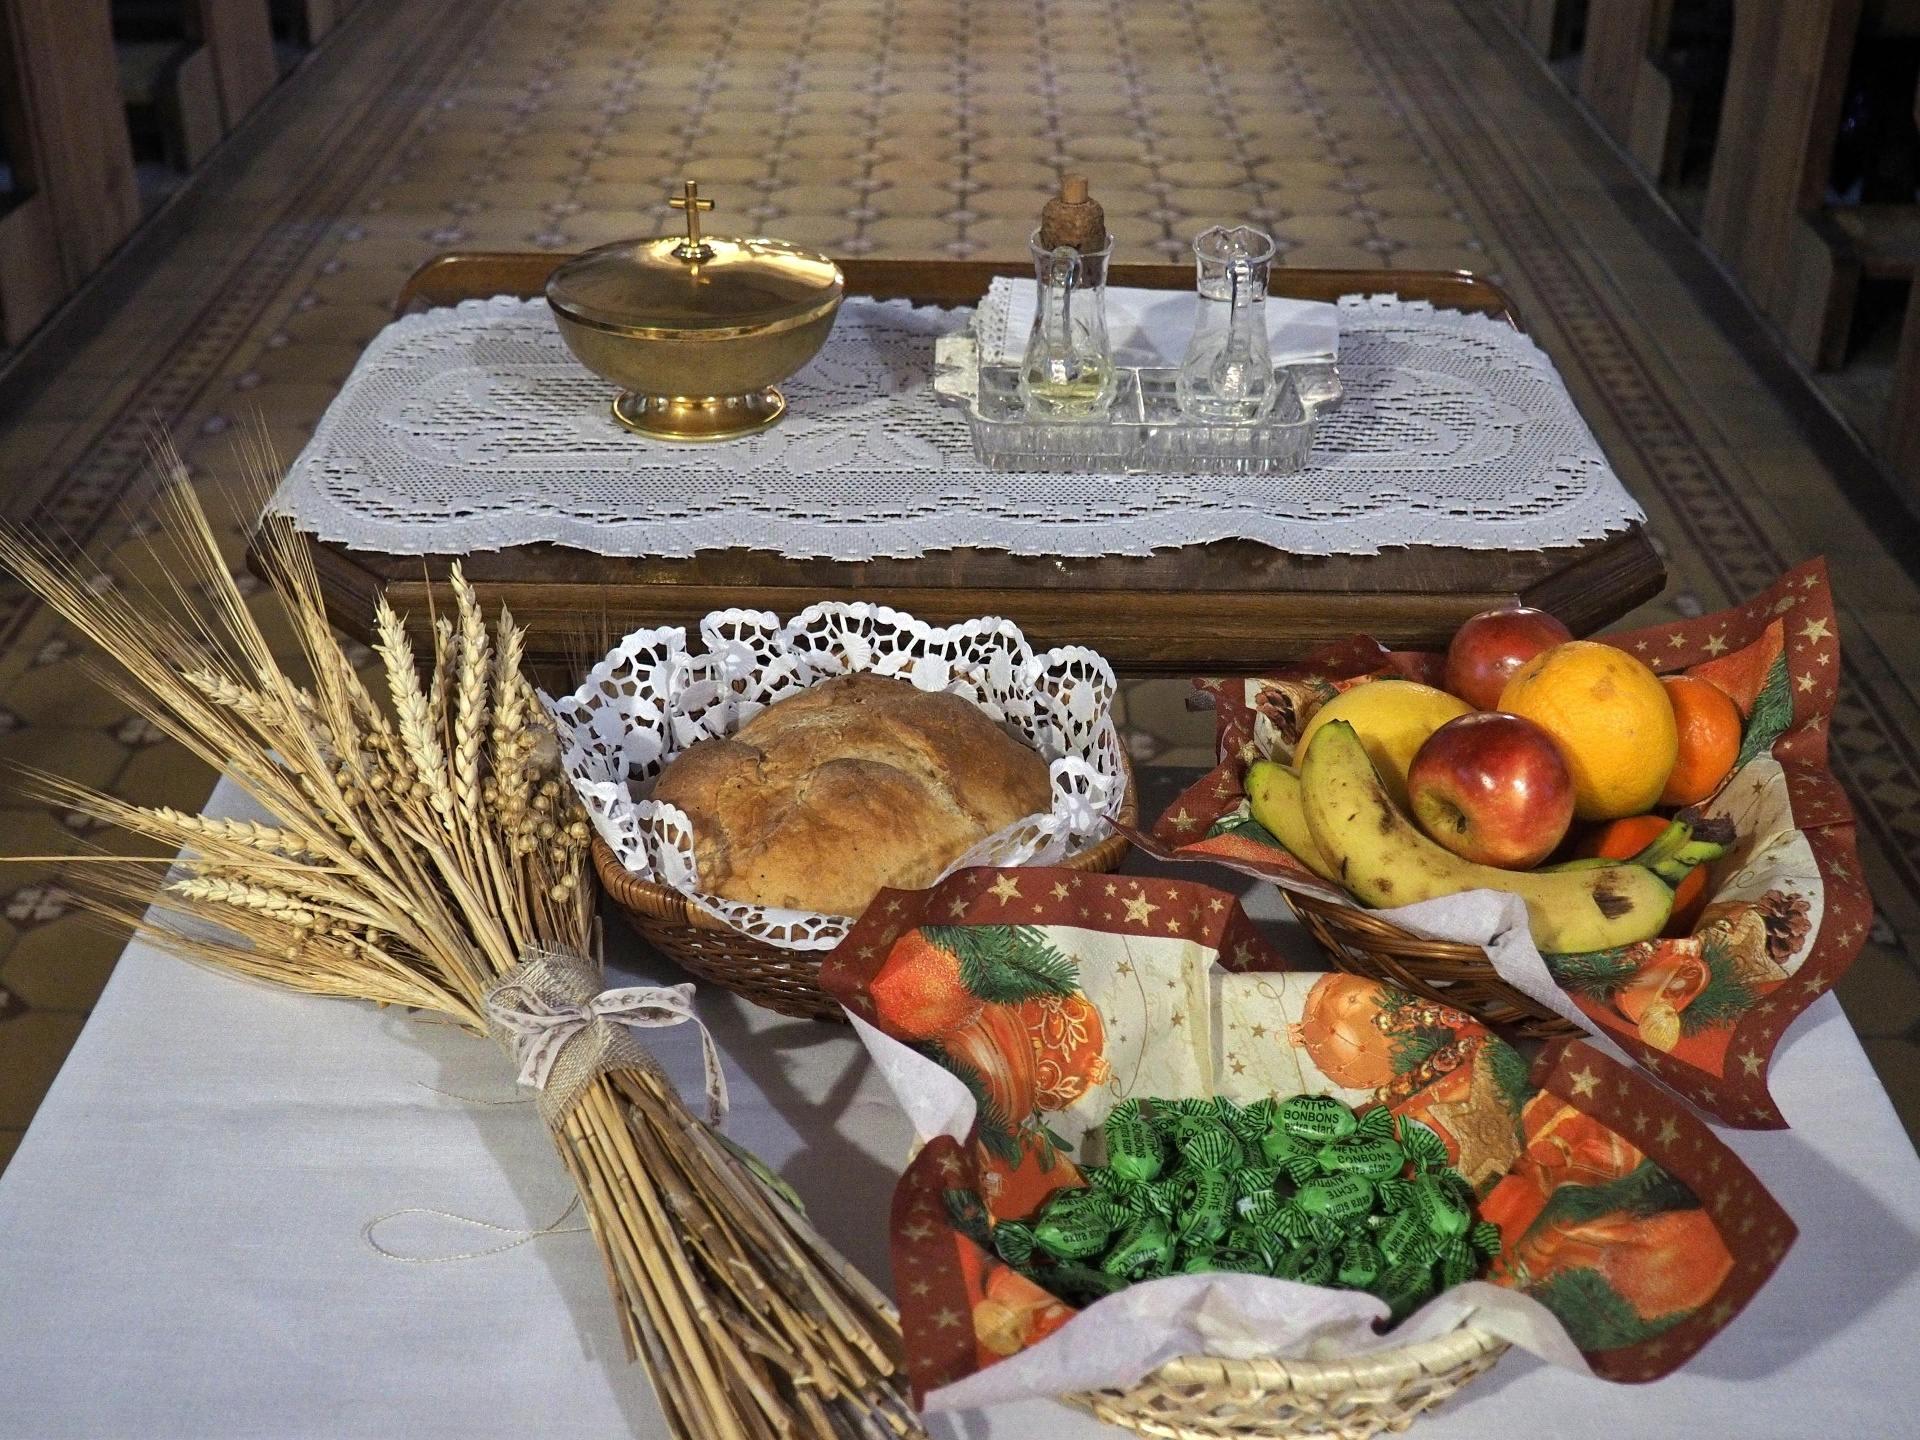 Novoročná sv. omša - 1. január 2018